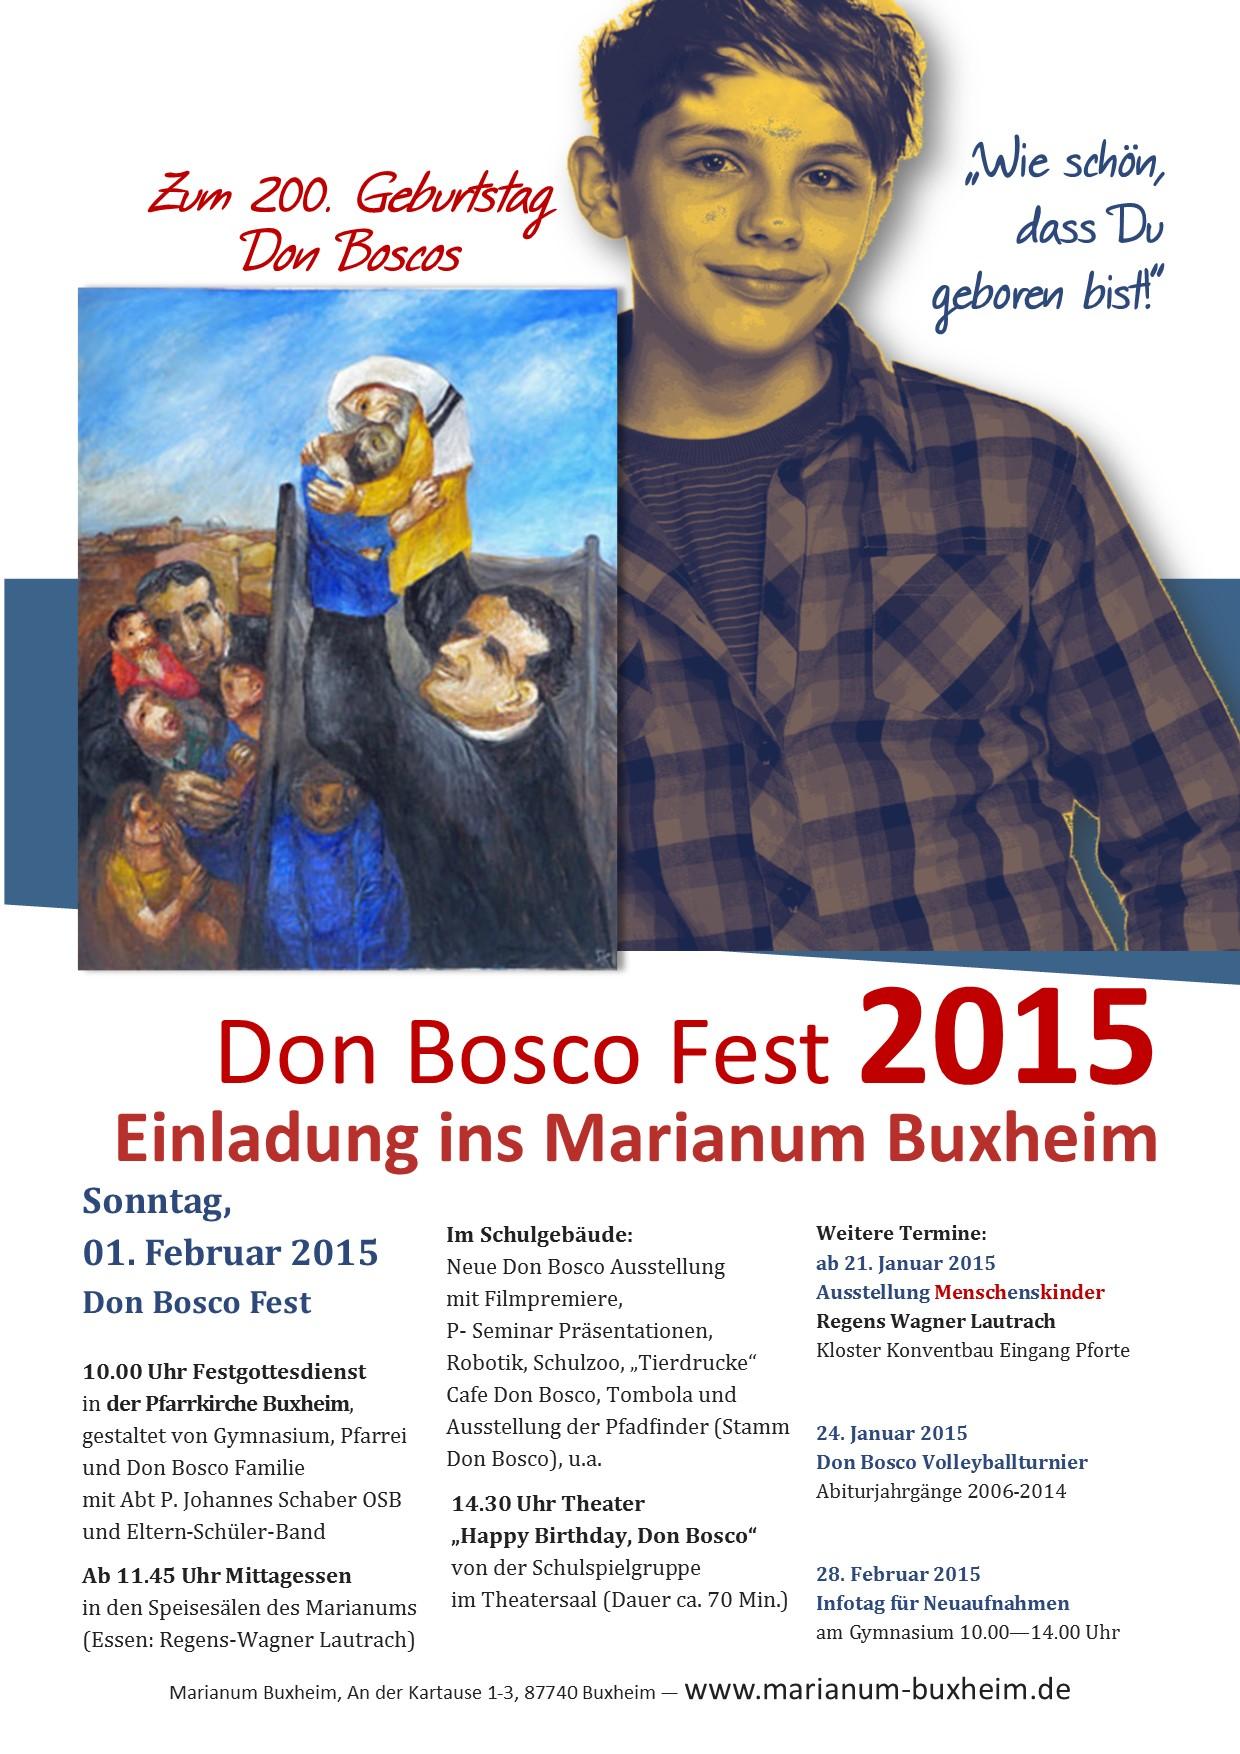 Don Bosco Fest 2015 Buxheim Plakat